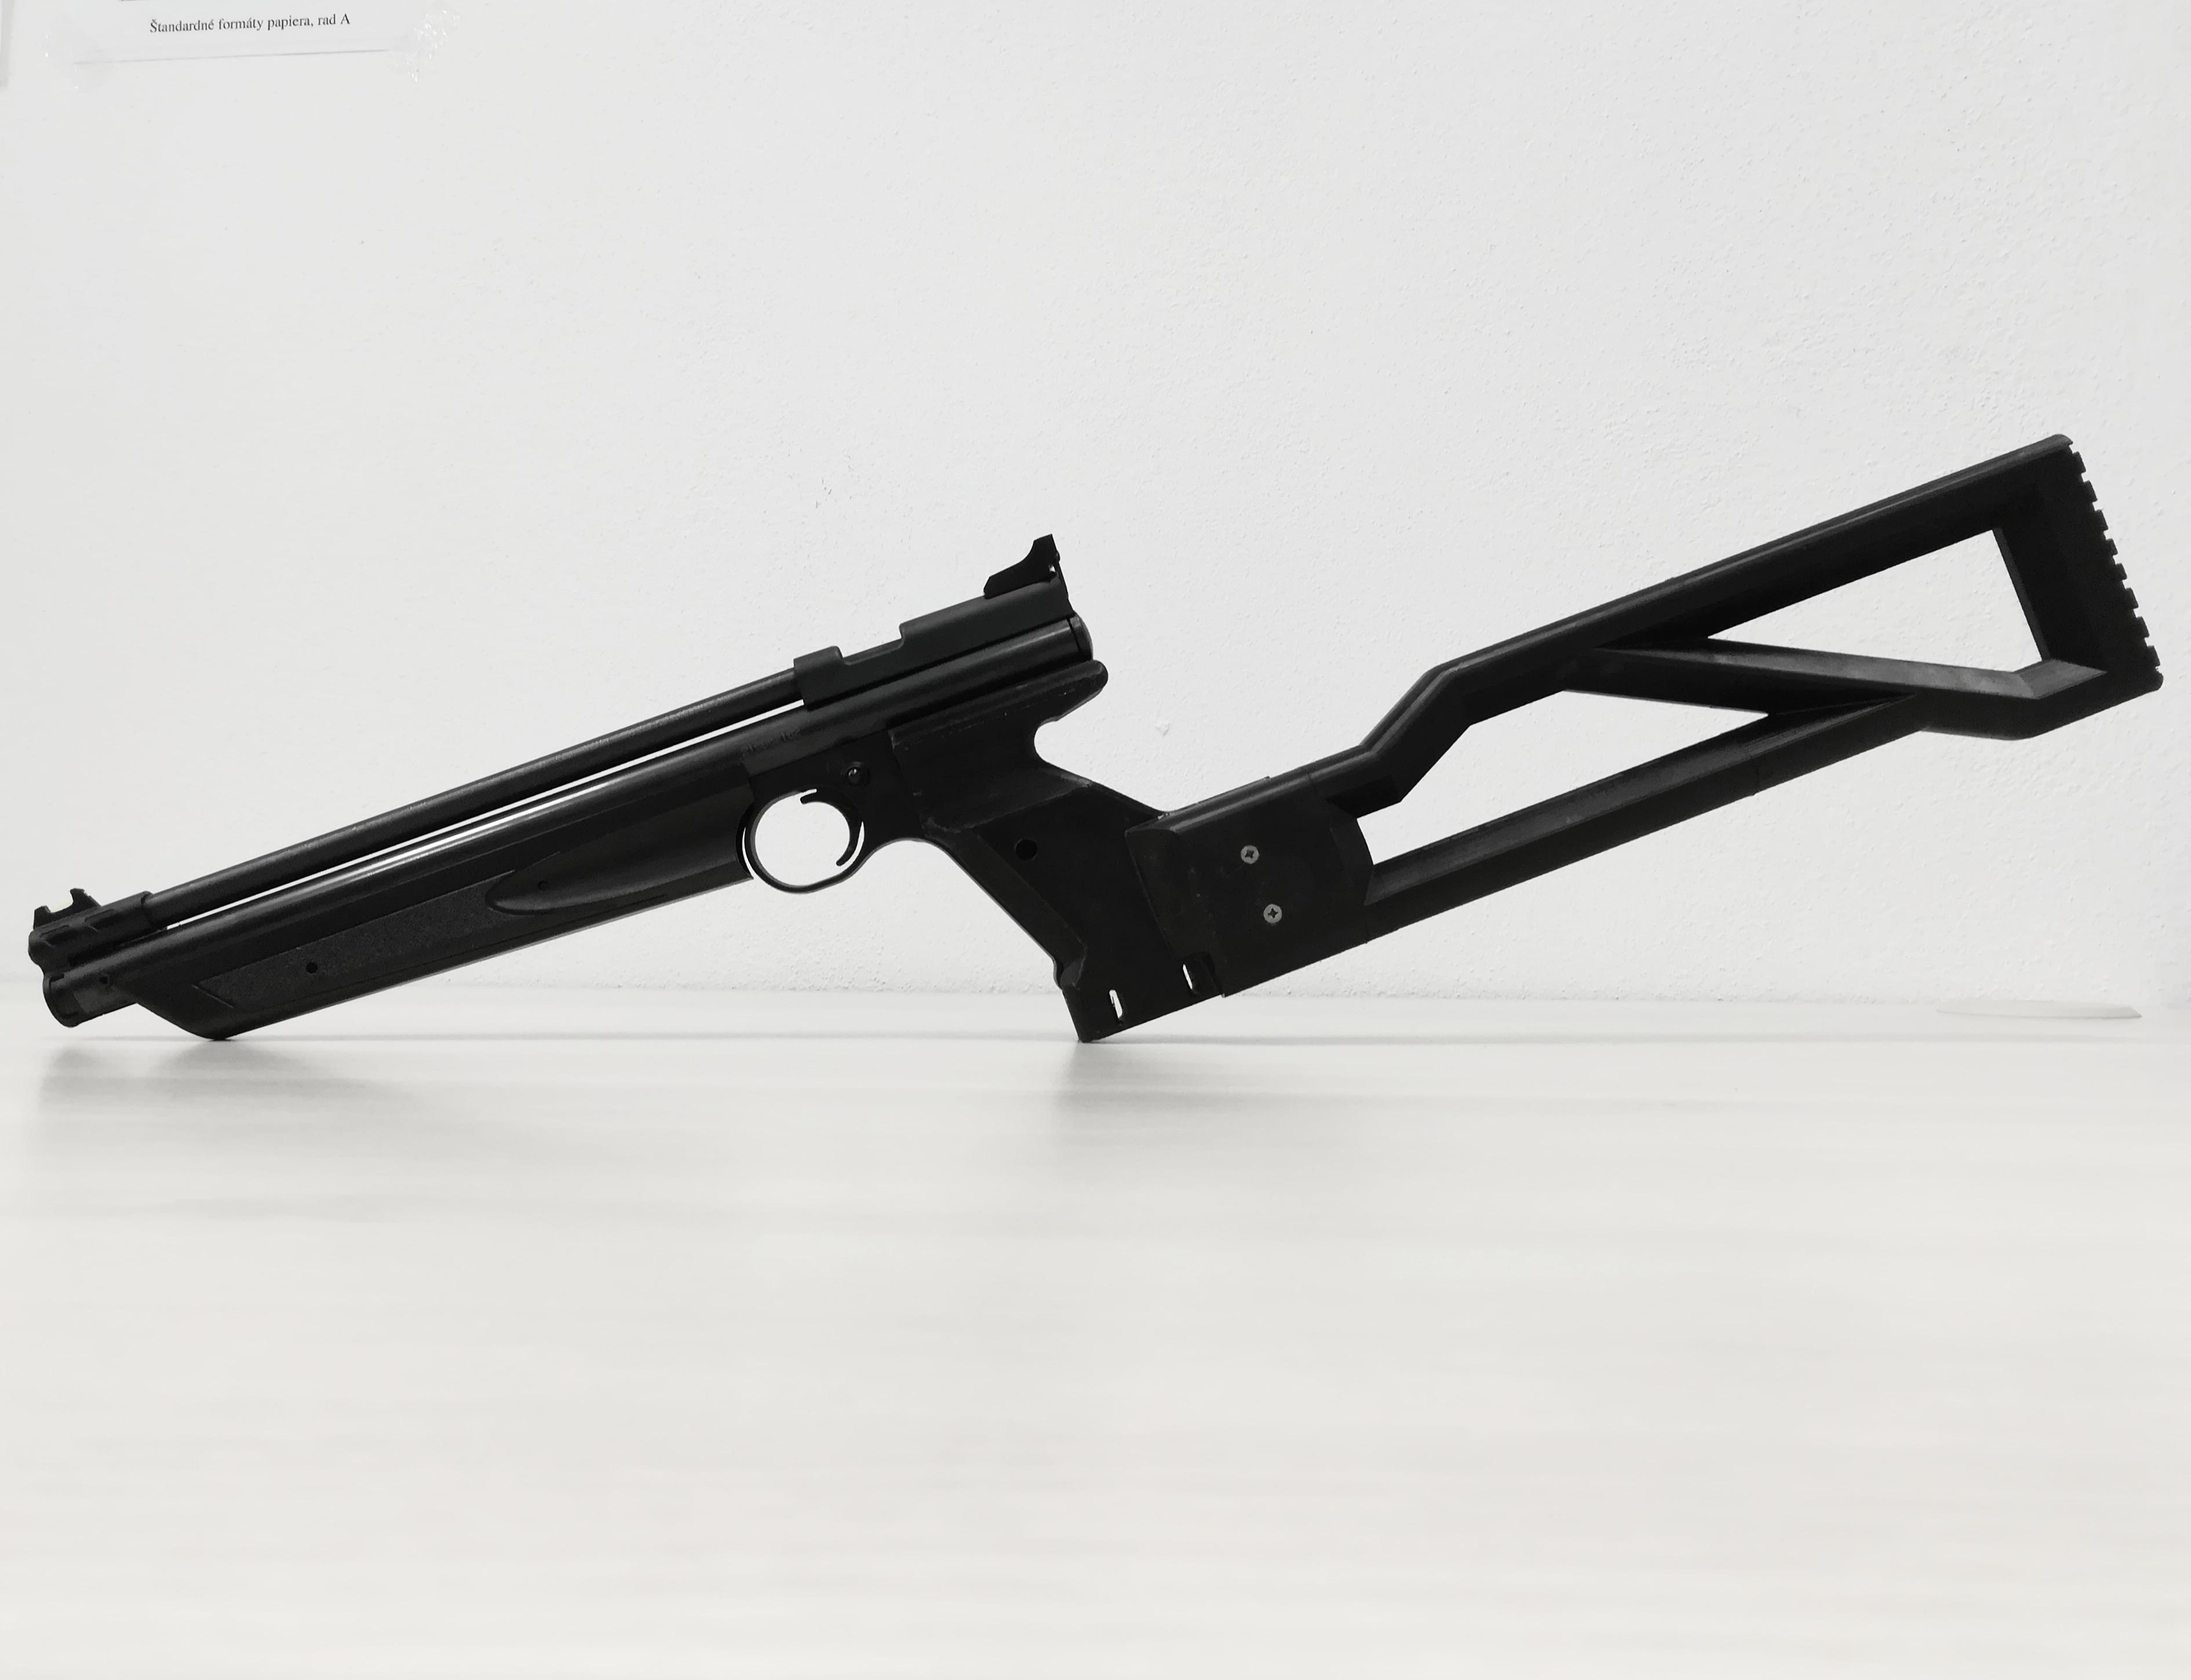 Beretta vzduchovka pažba